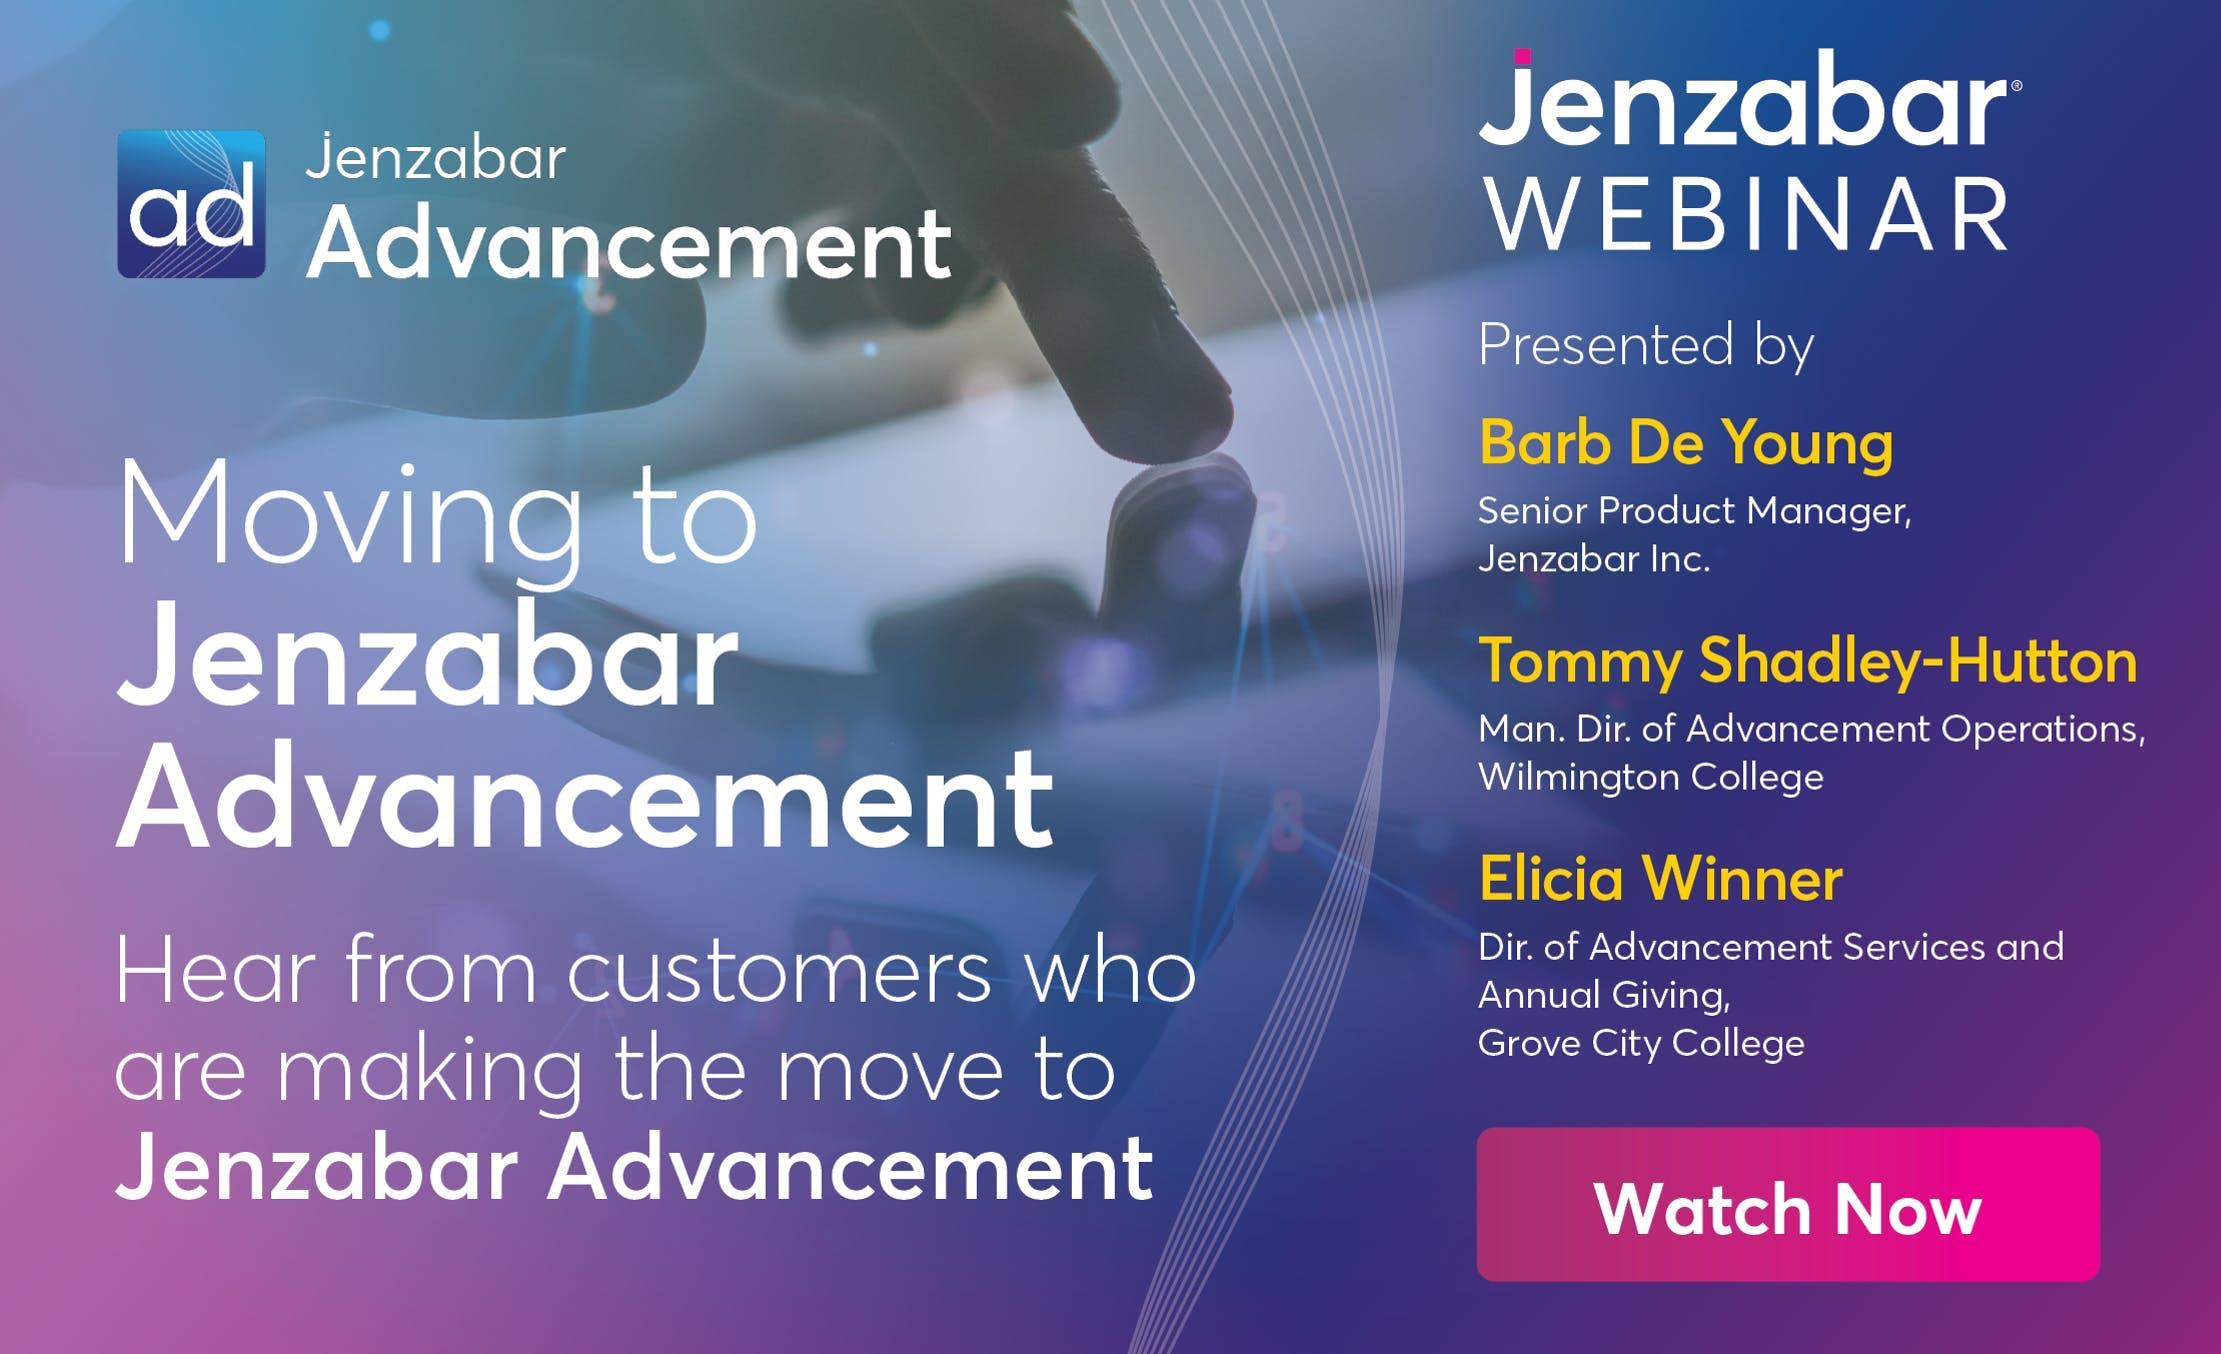 Moving to Jenzabar Advancement